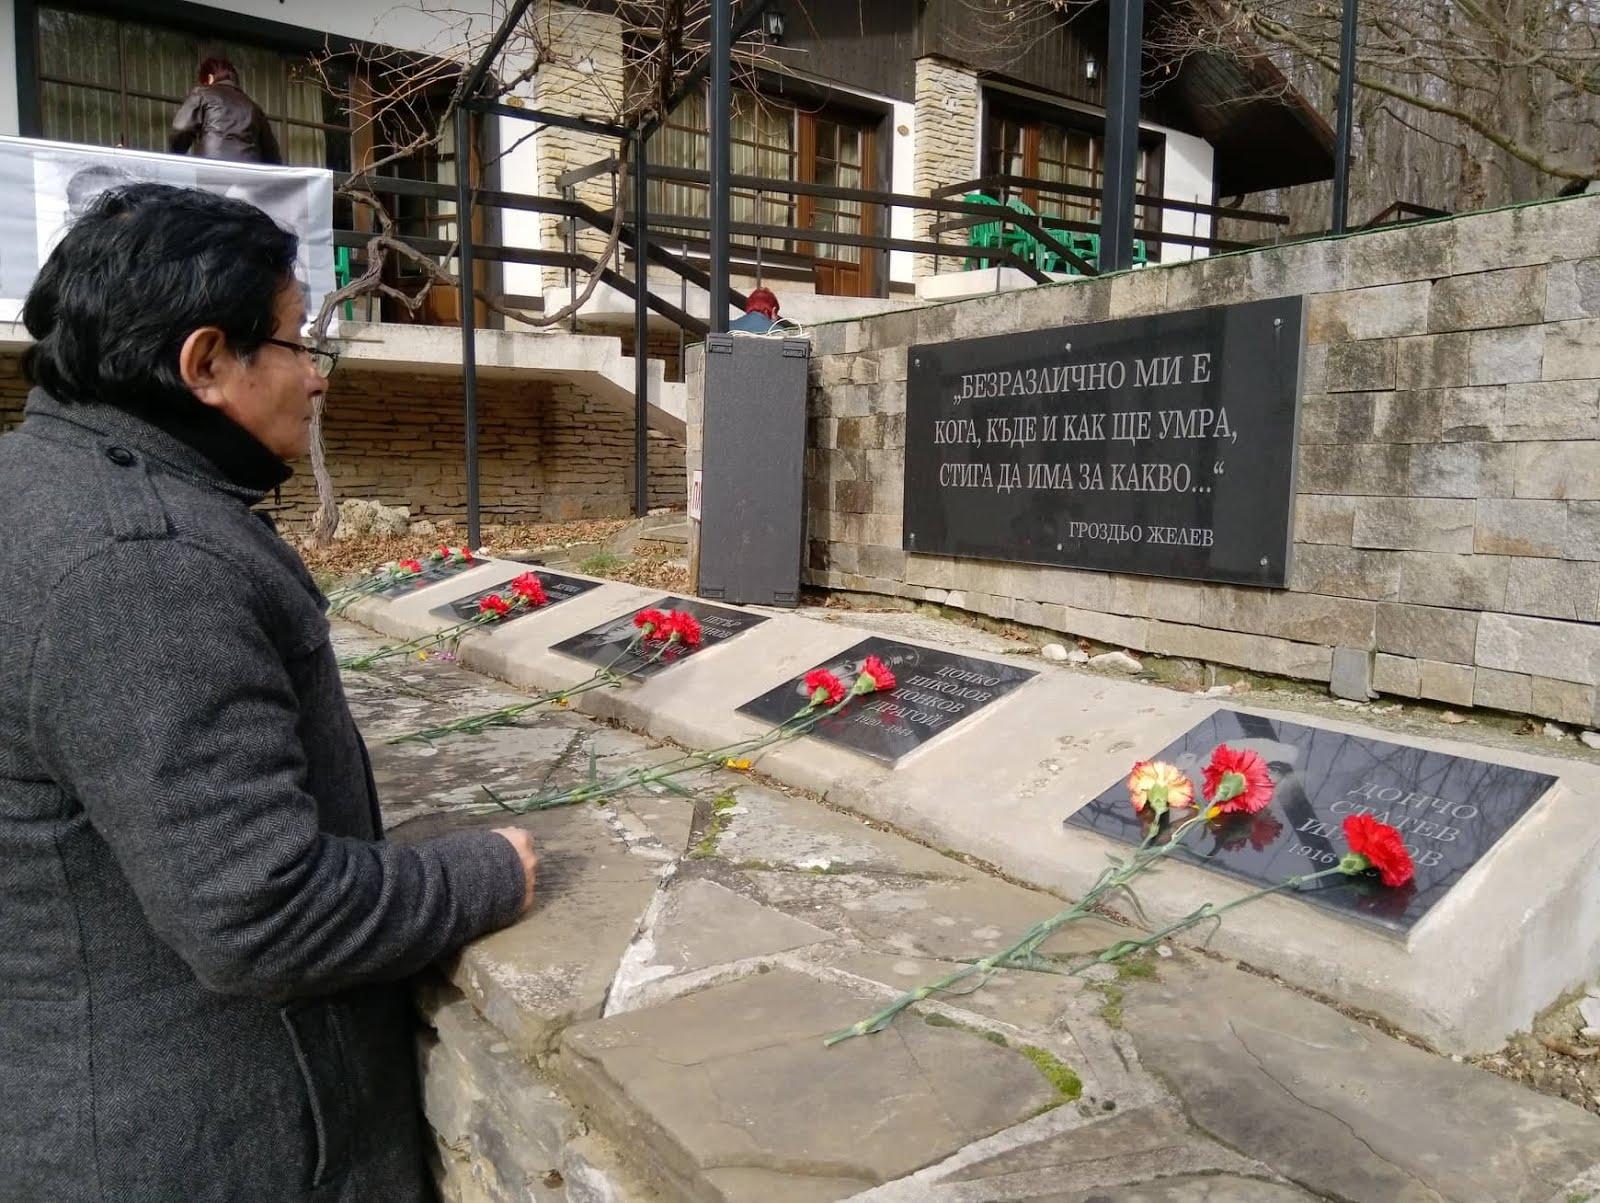 Juan Yupanqui - rinde honor al partisano búlgaro matado por los fascistas